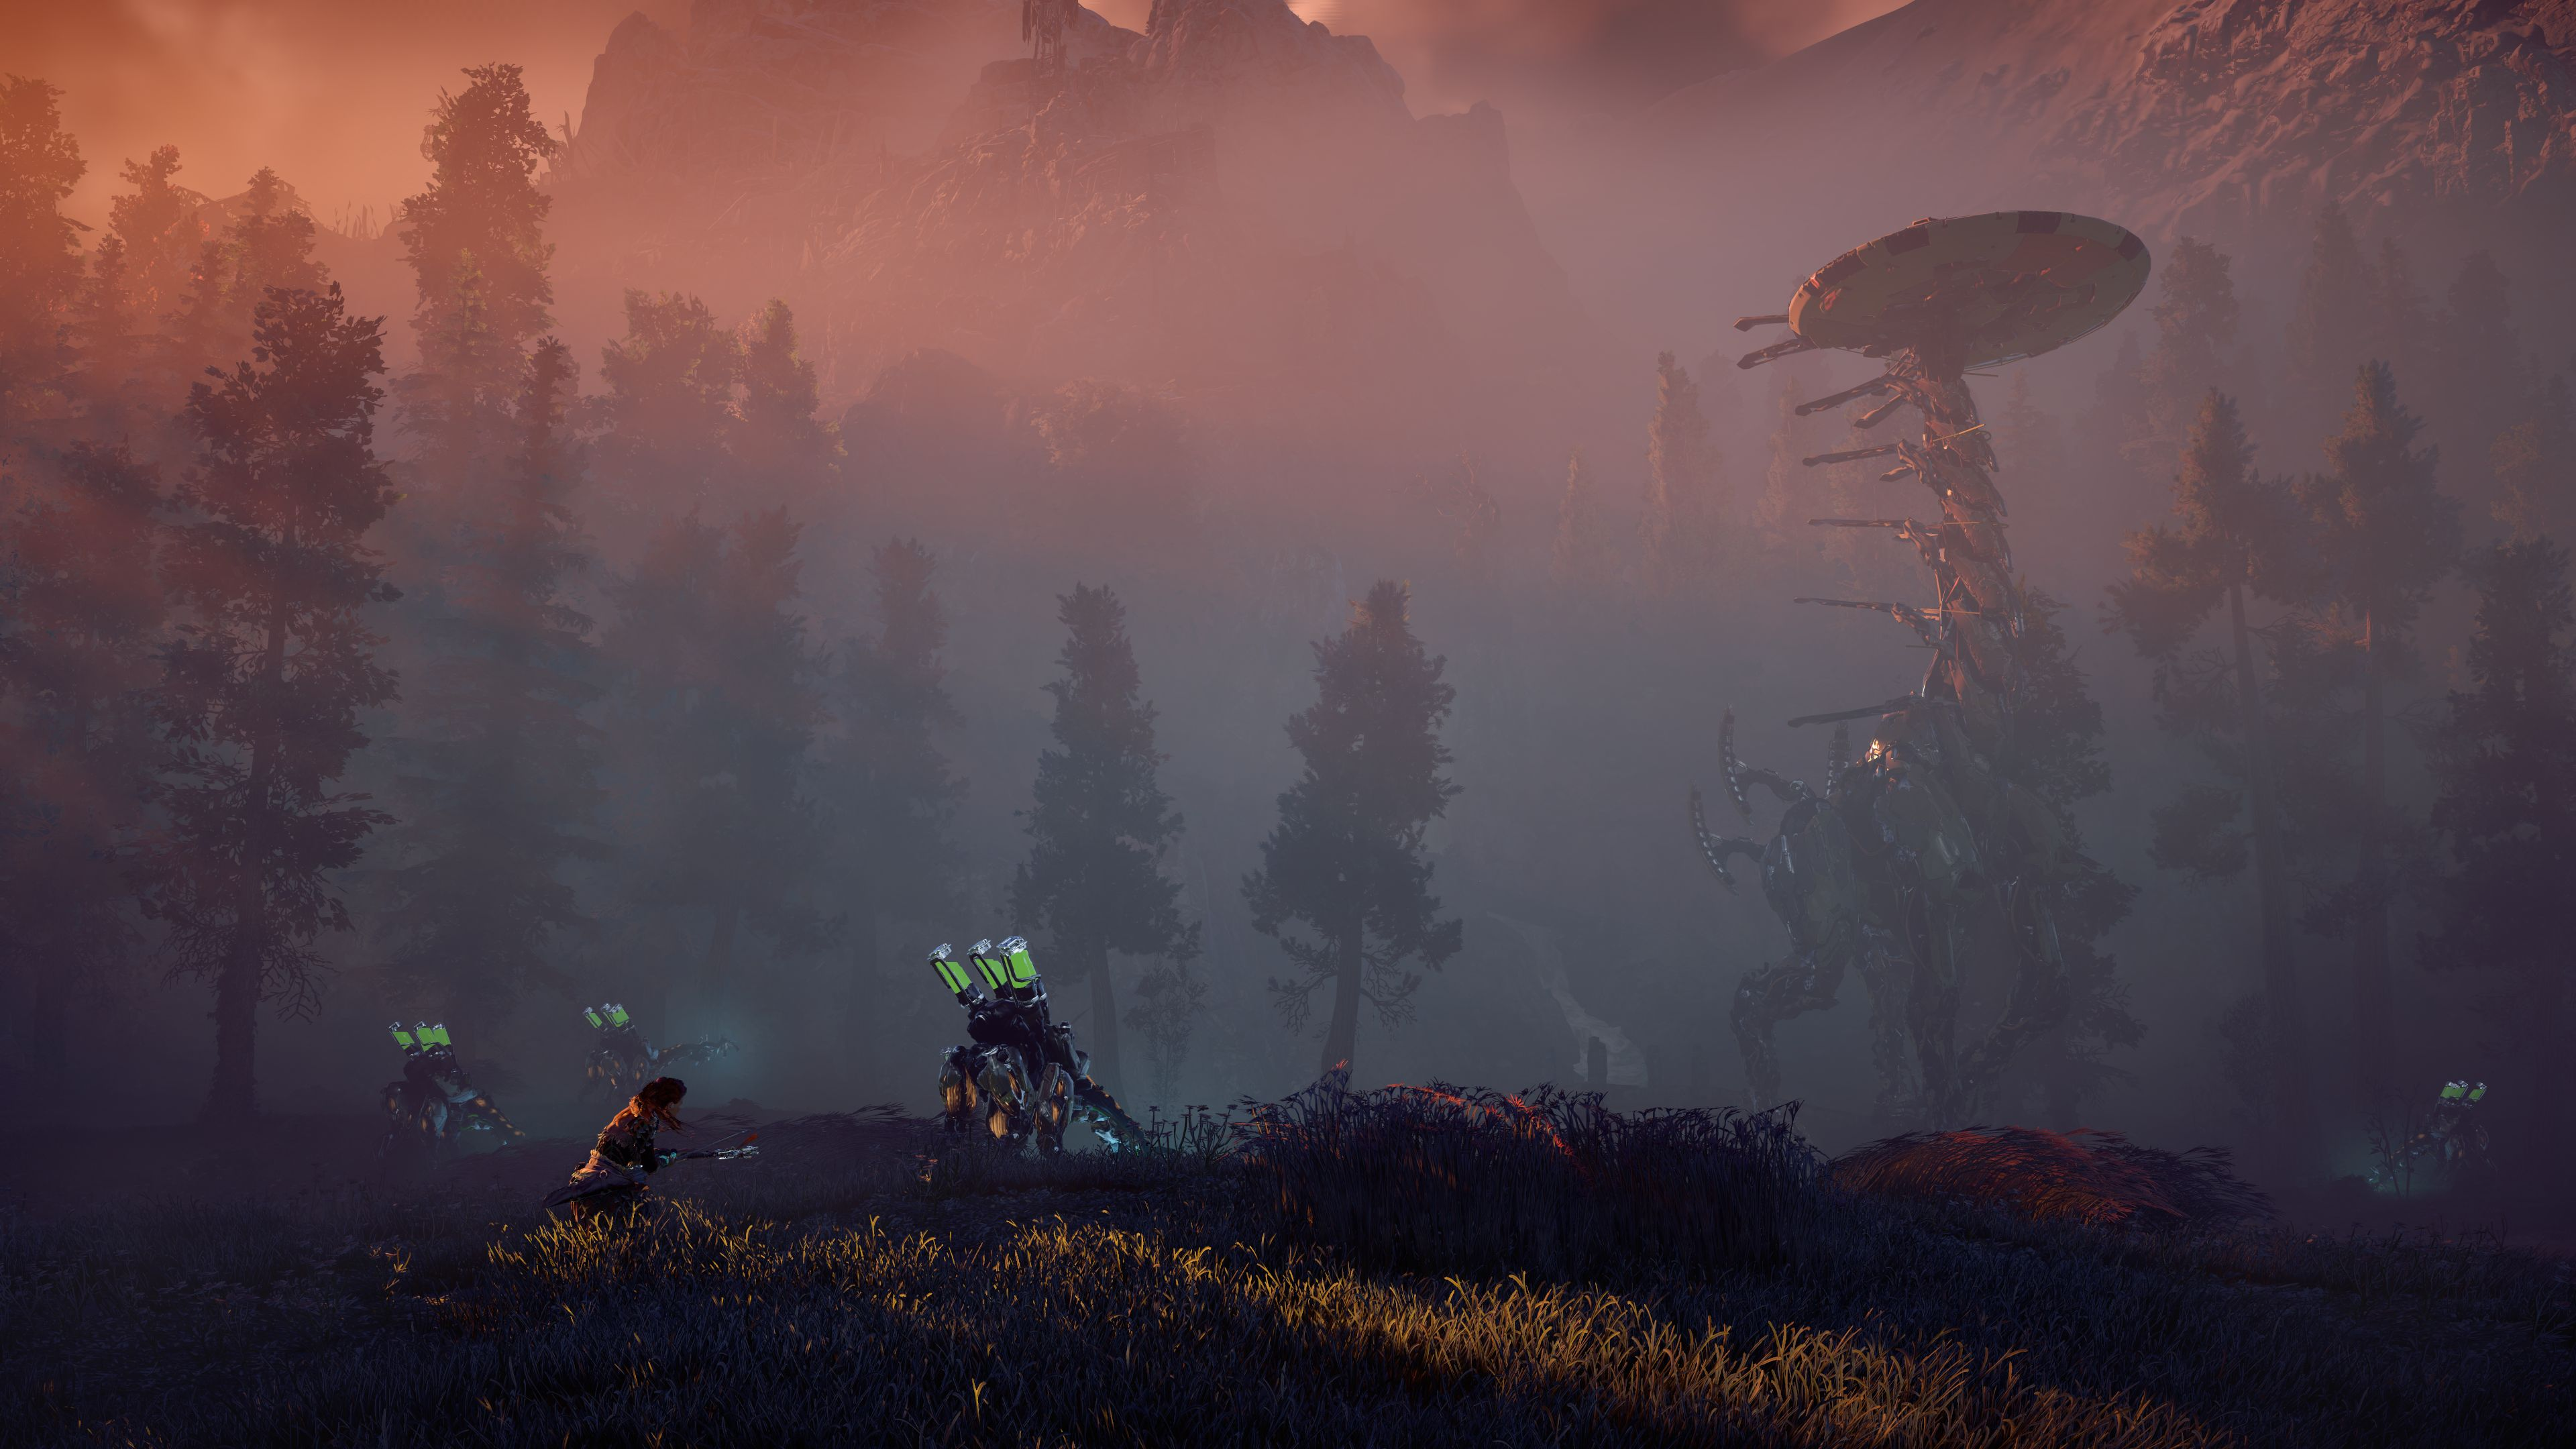 Horizon Zero Dawn, Forest, Playstation 4, Aloy, Morning - Background Horizon Zero Dawn 4k , HD Wallpaper & Backgrounds